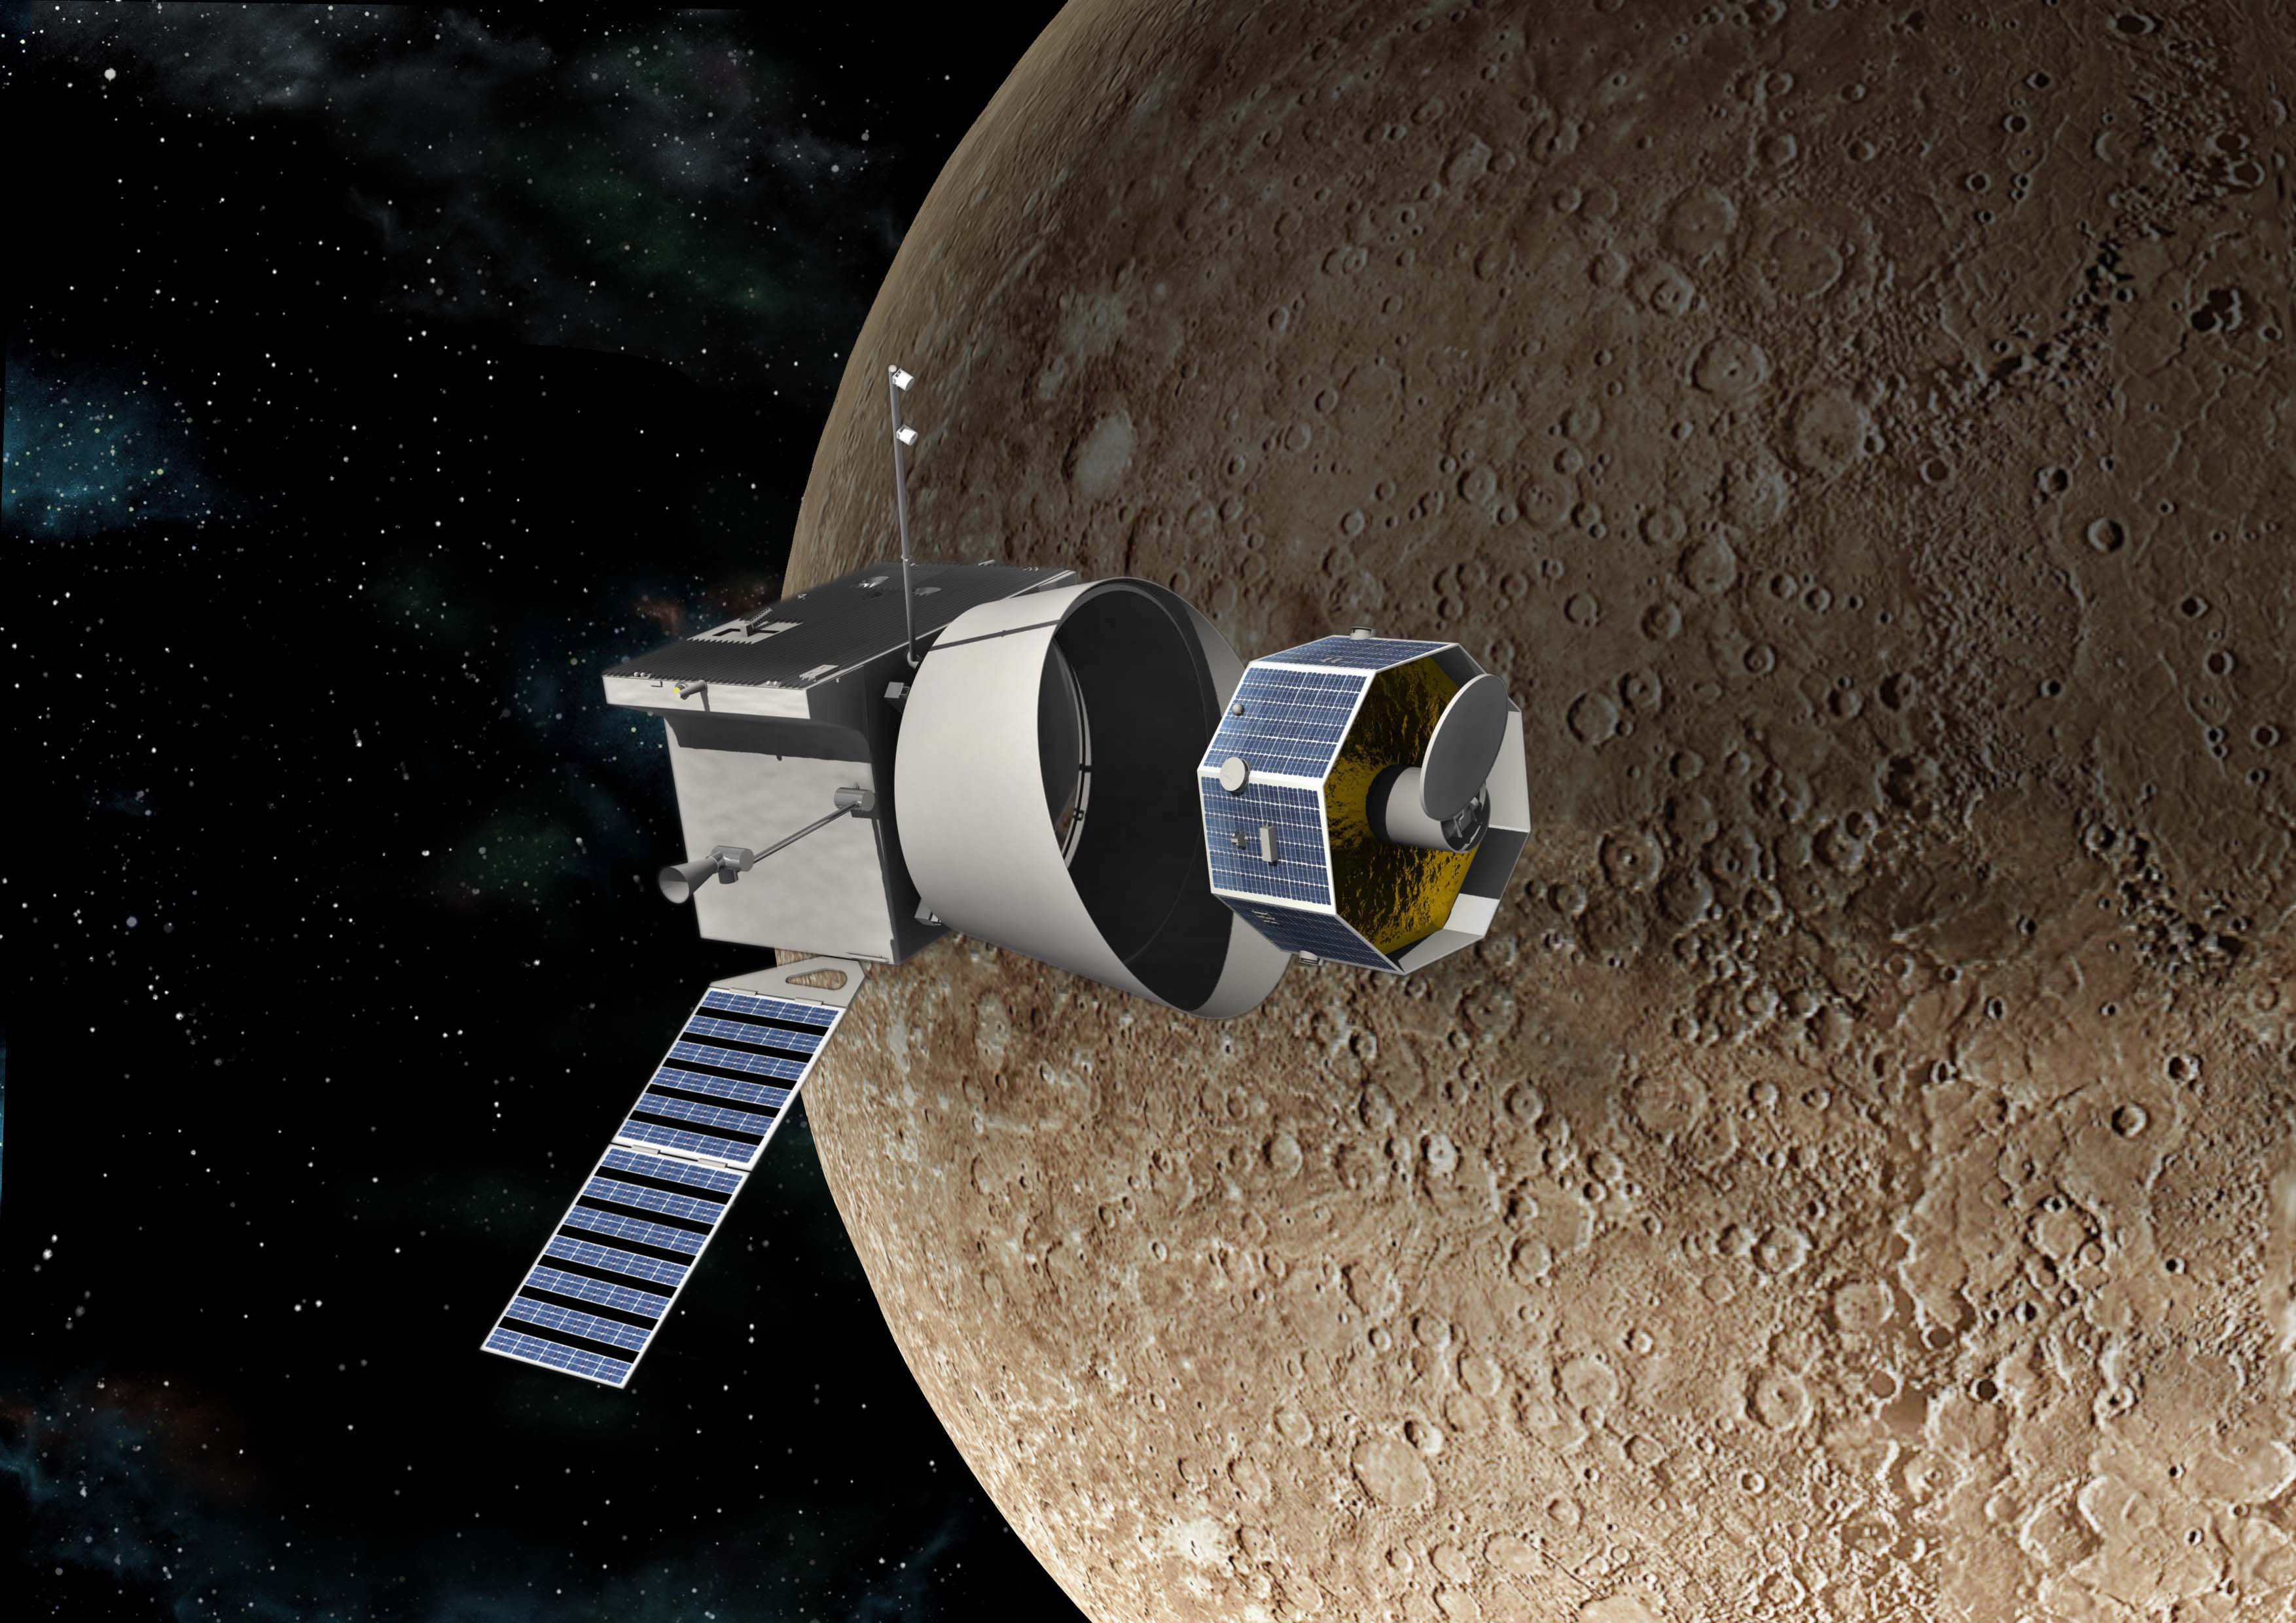 messenger spacecraft discoveries - 880×622